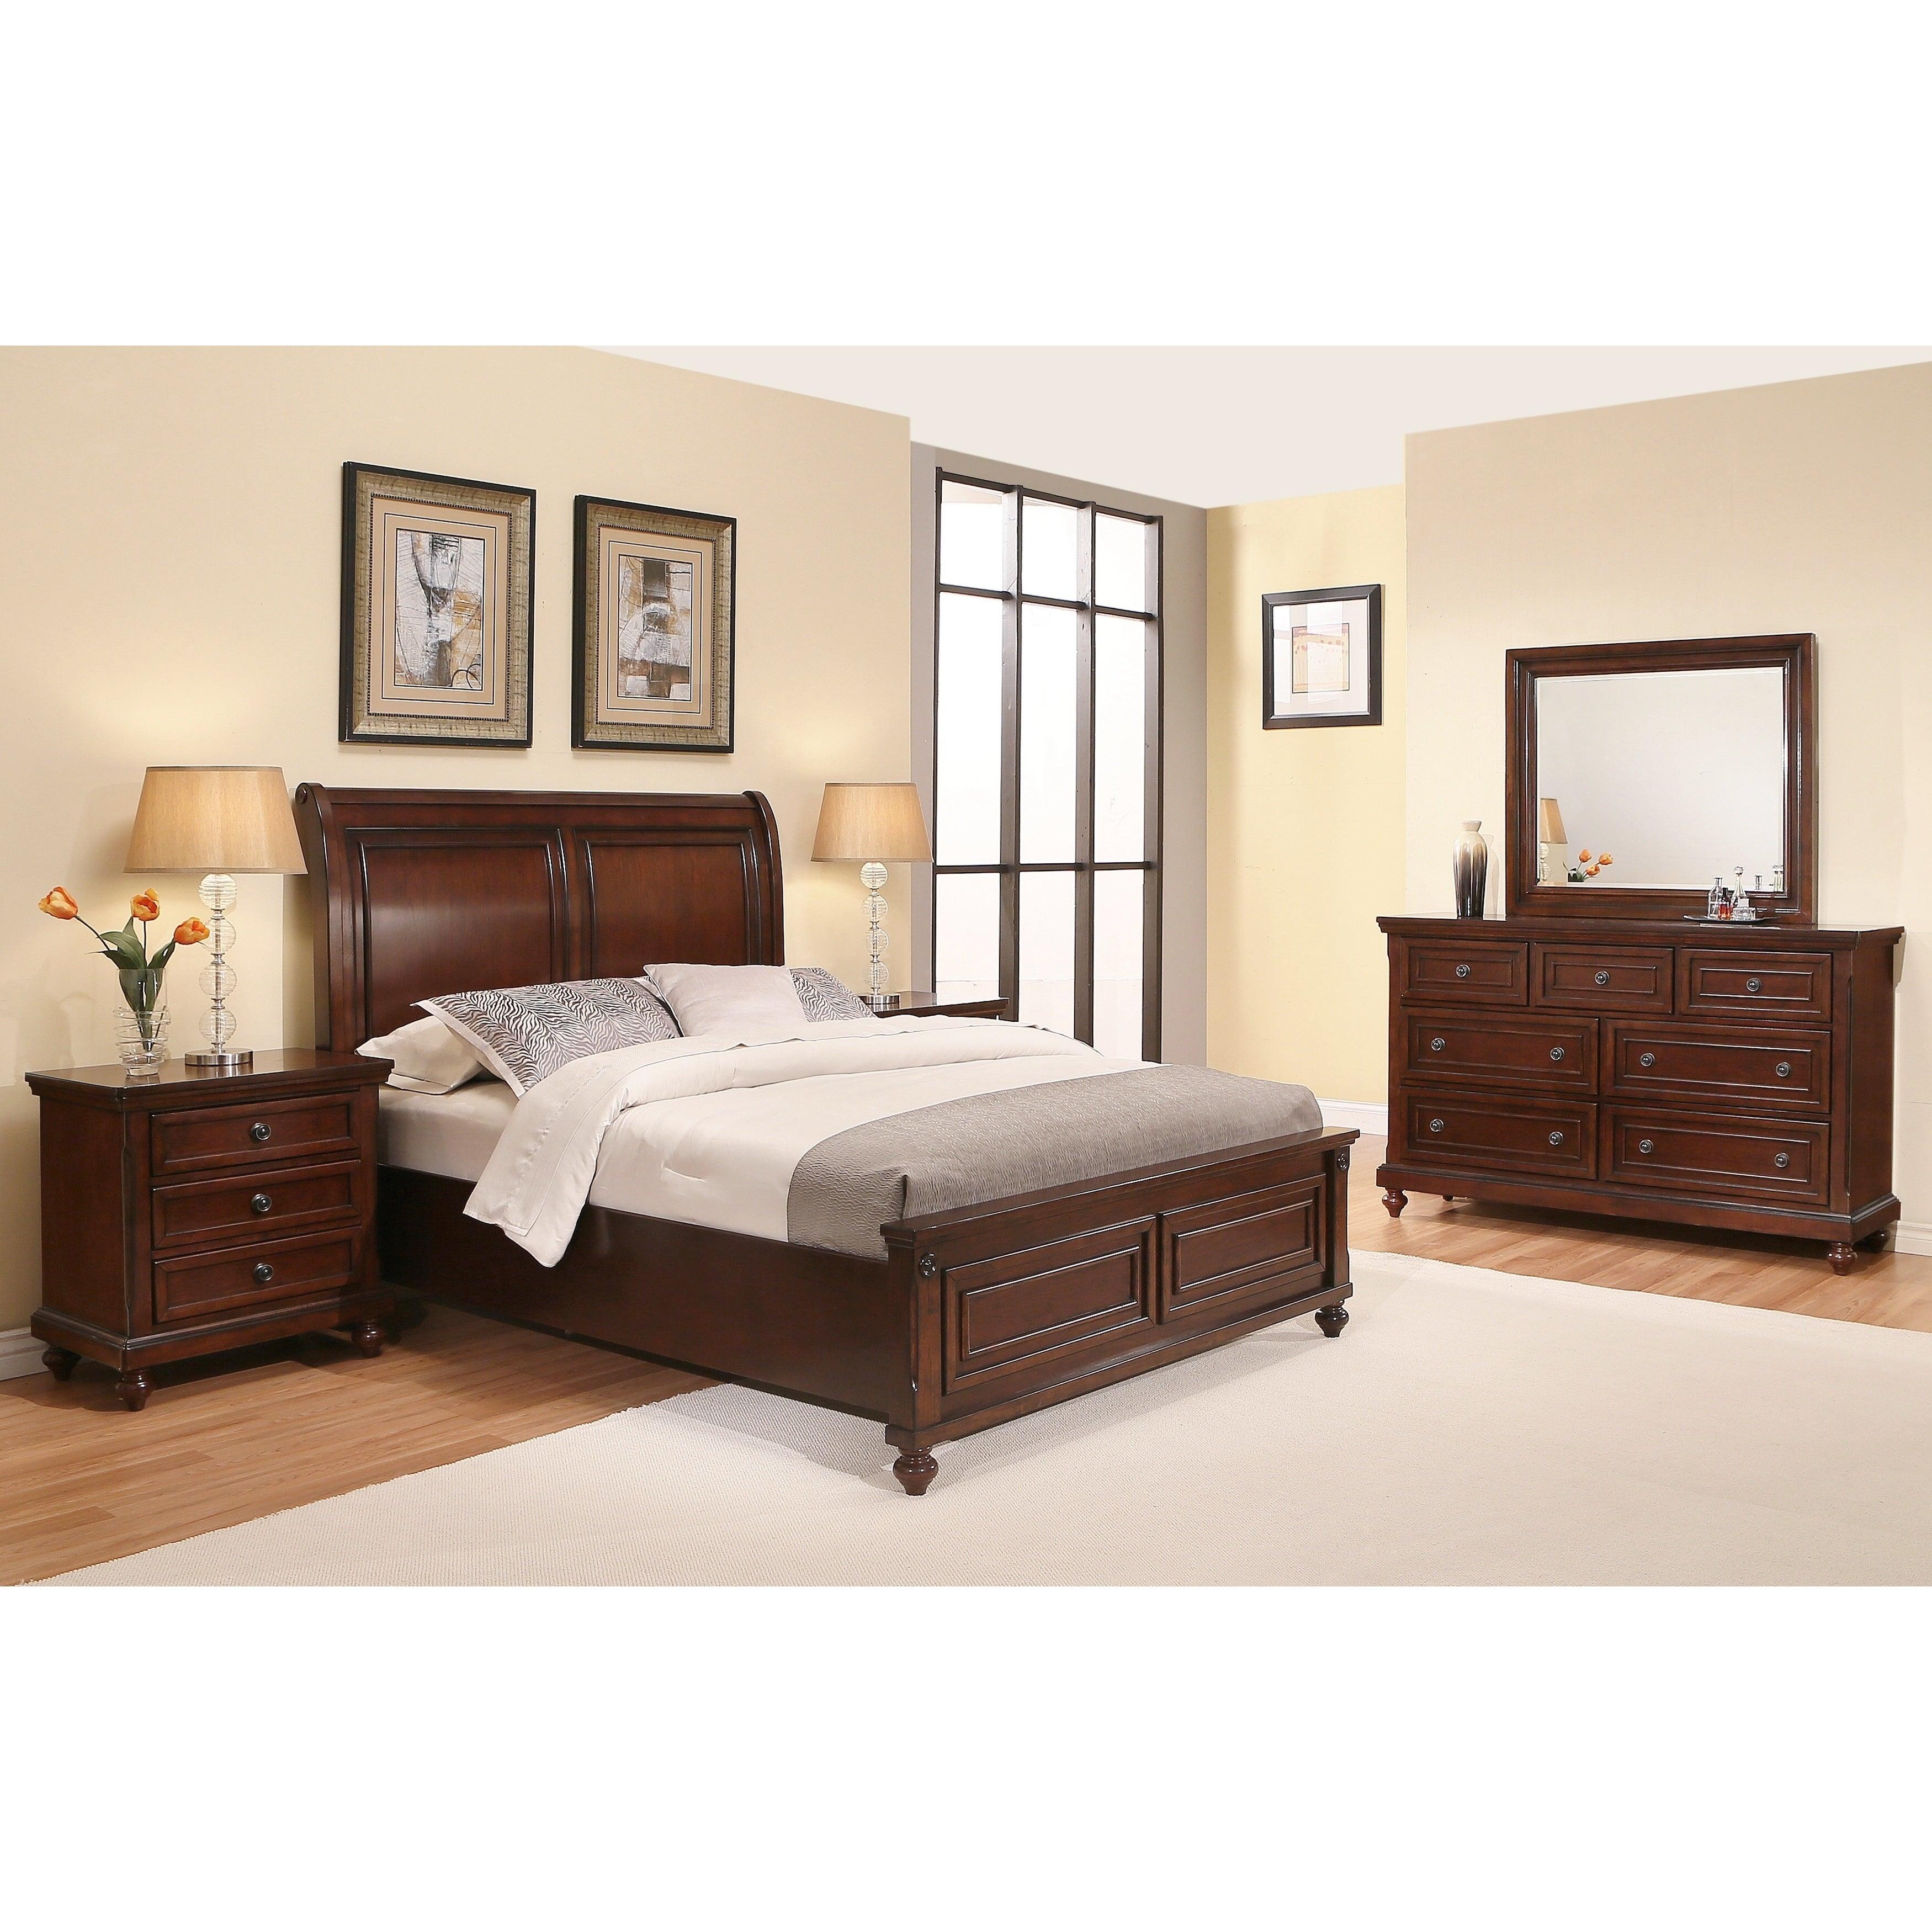 Shop Abbyson Caprice Cherry Wood Bedroom Set (5 piece)   On Sale